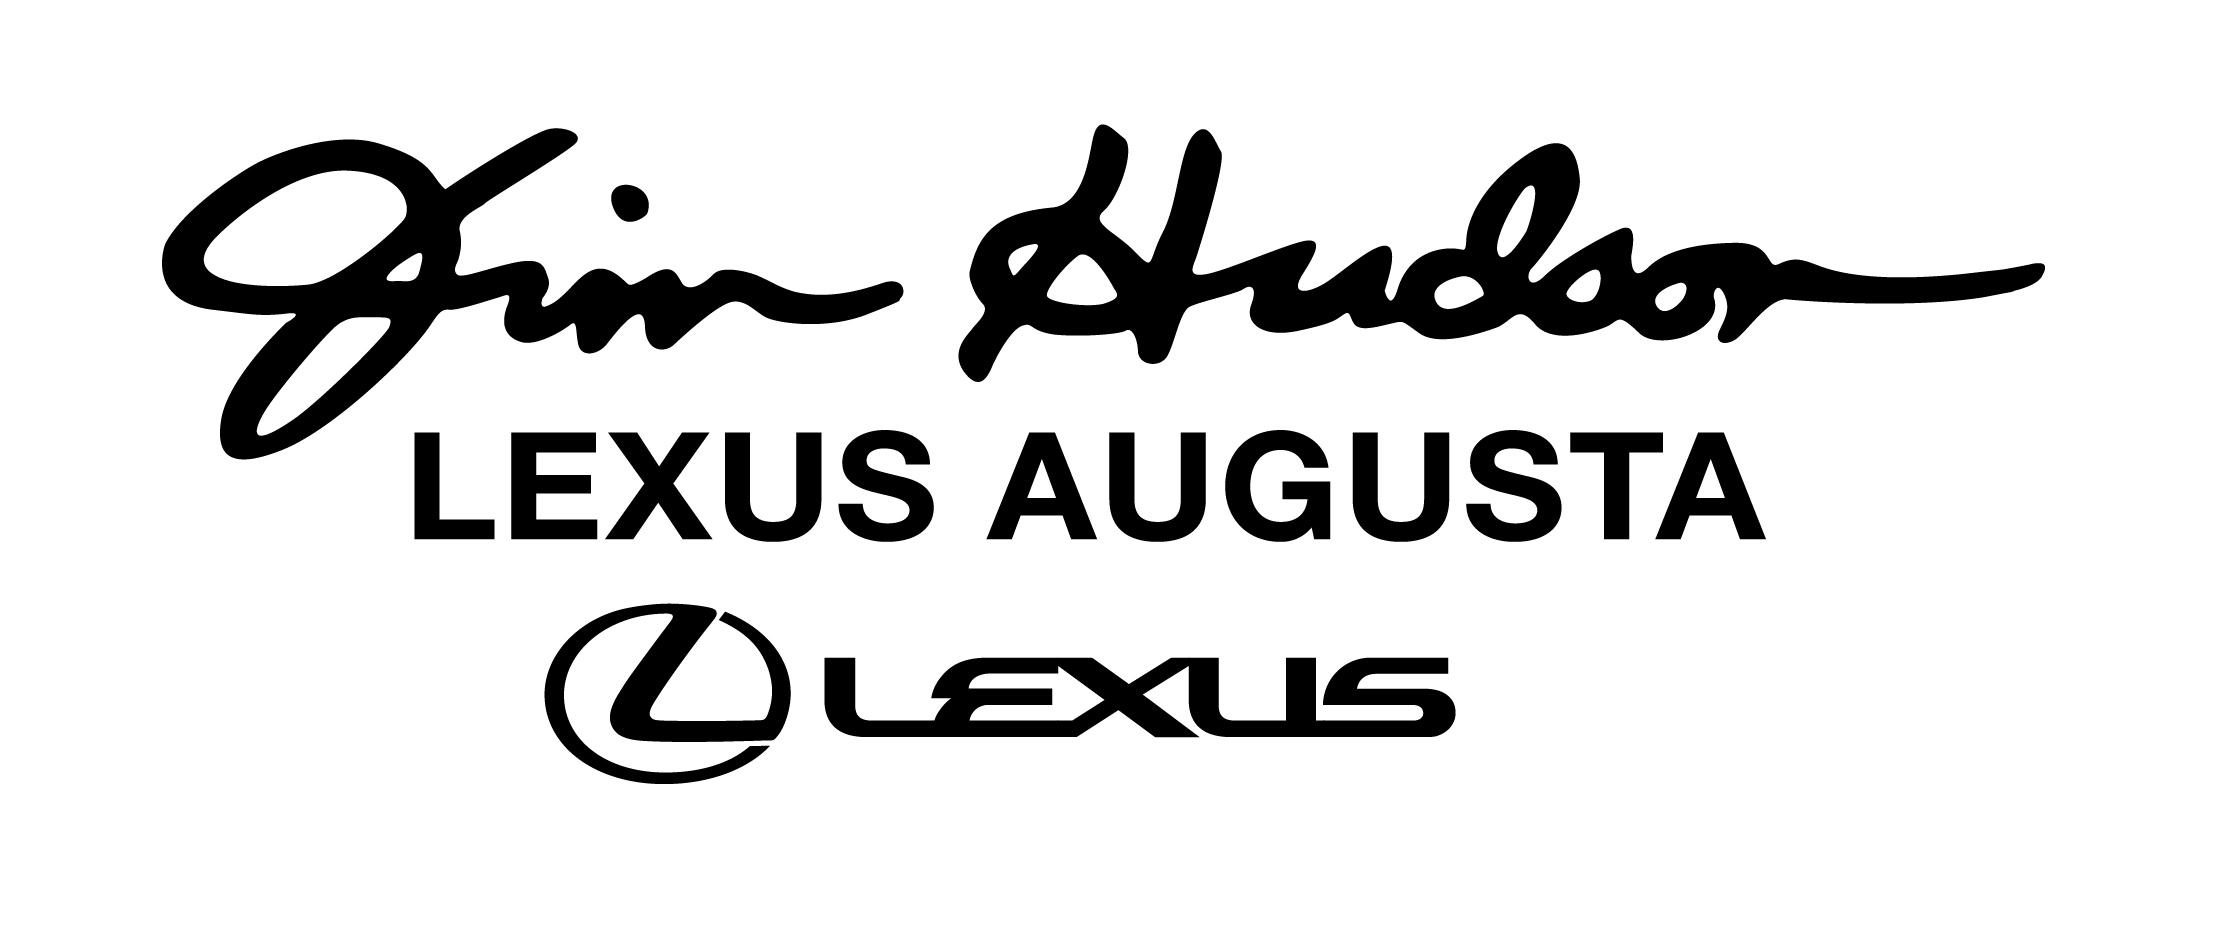 jim hudson lexus of augusta 3520 washington rd, augusta, ga 30907